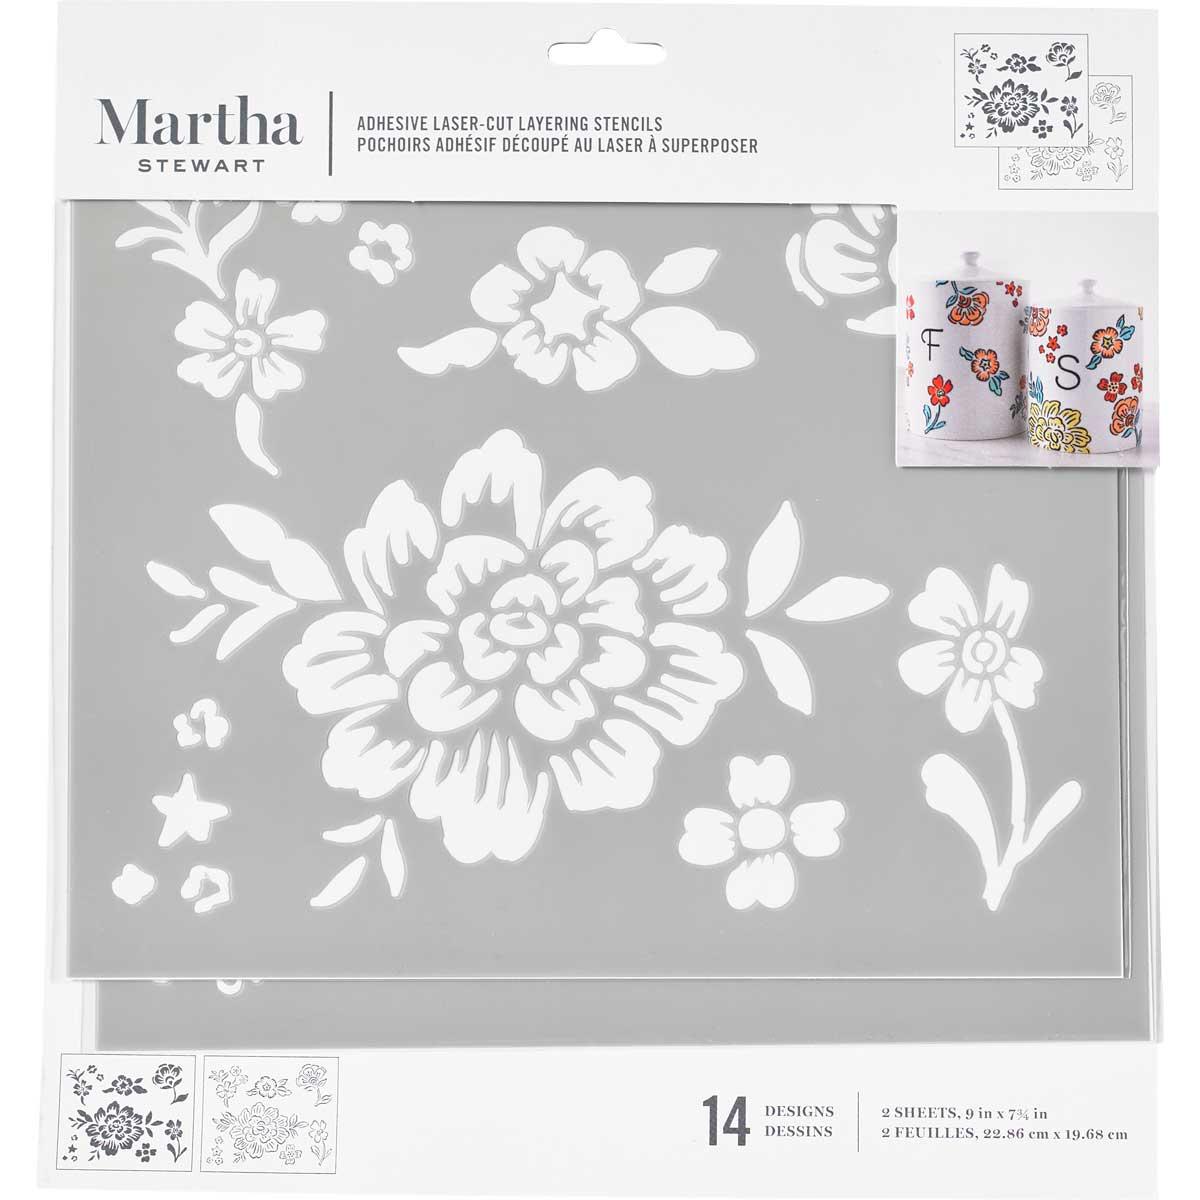 Martha Stewart® Adhesive Stencil - Floral